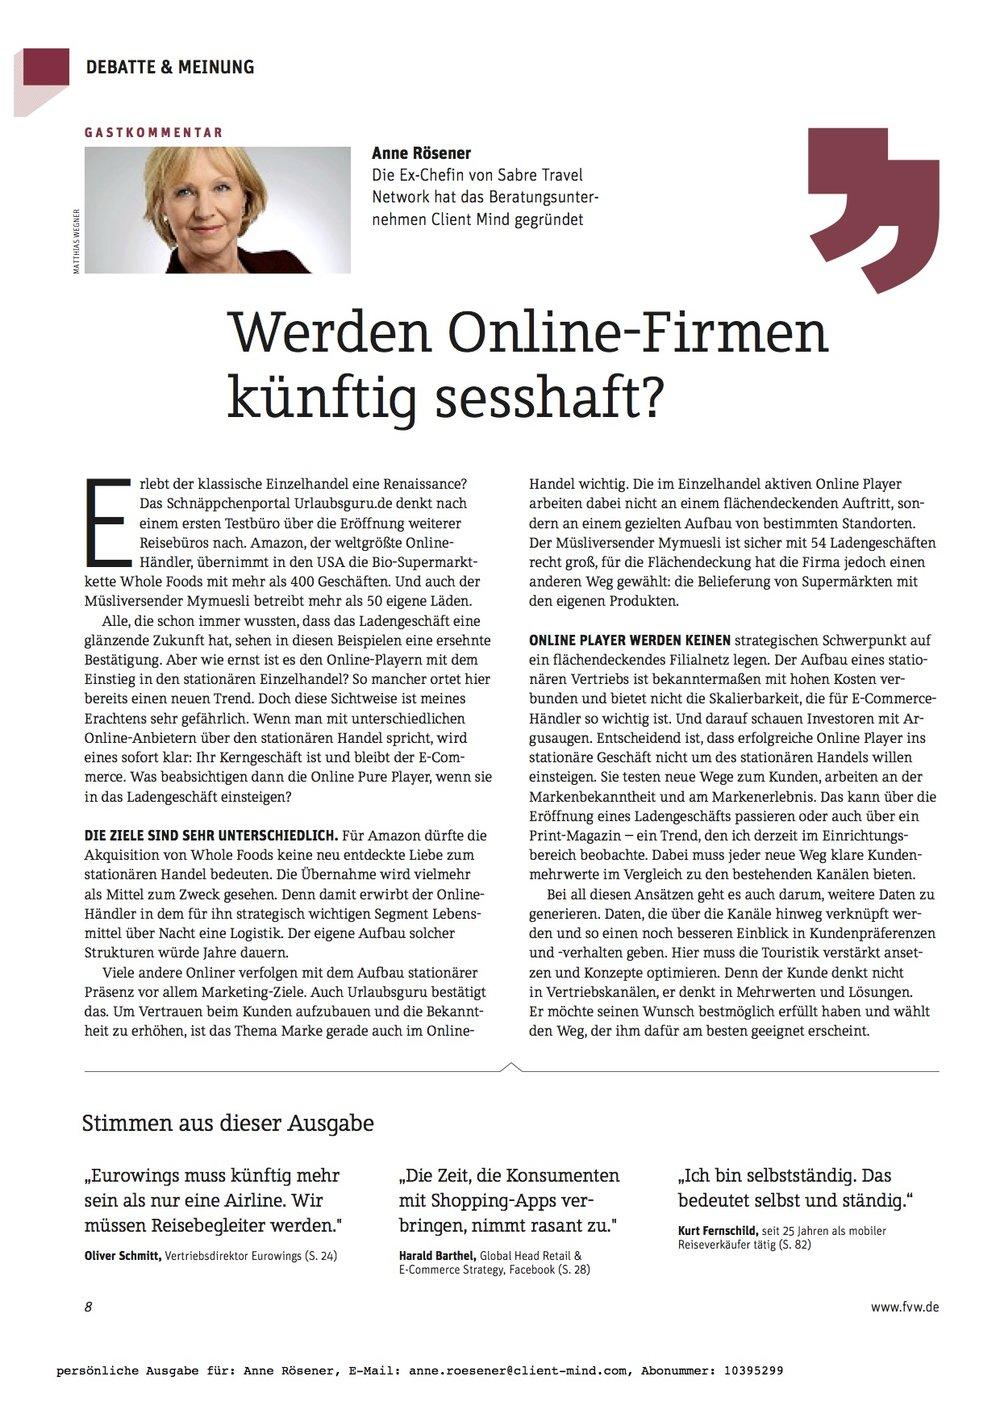 Werden Online-Firmen künftig sesshaft?.jpg